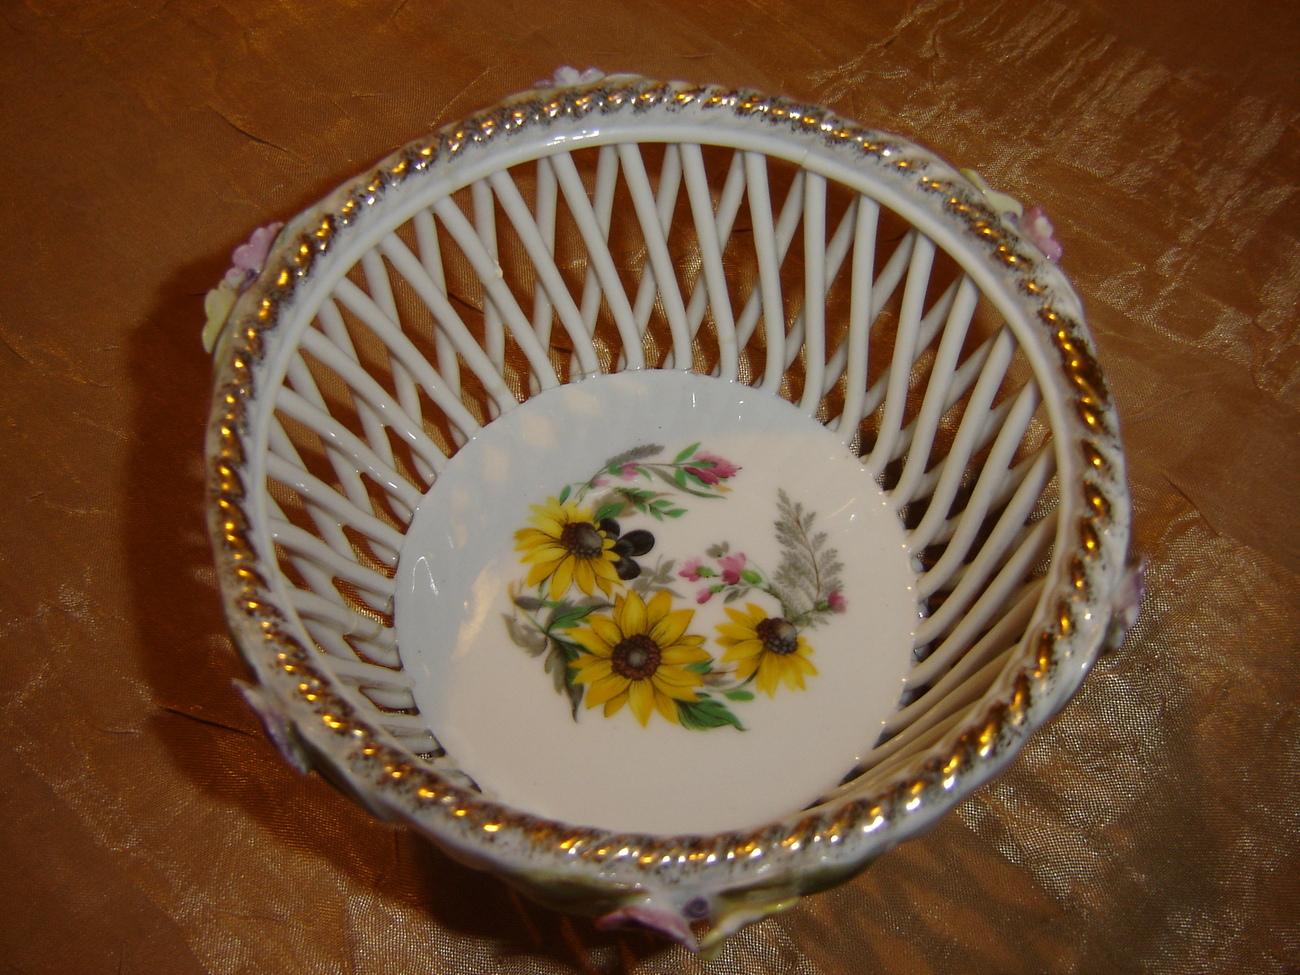 Handmade Weave Lace Porcelain Bowl